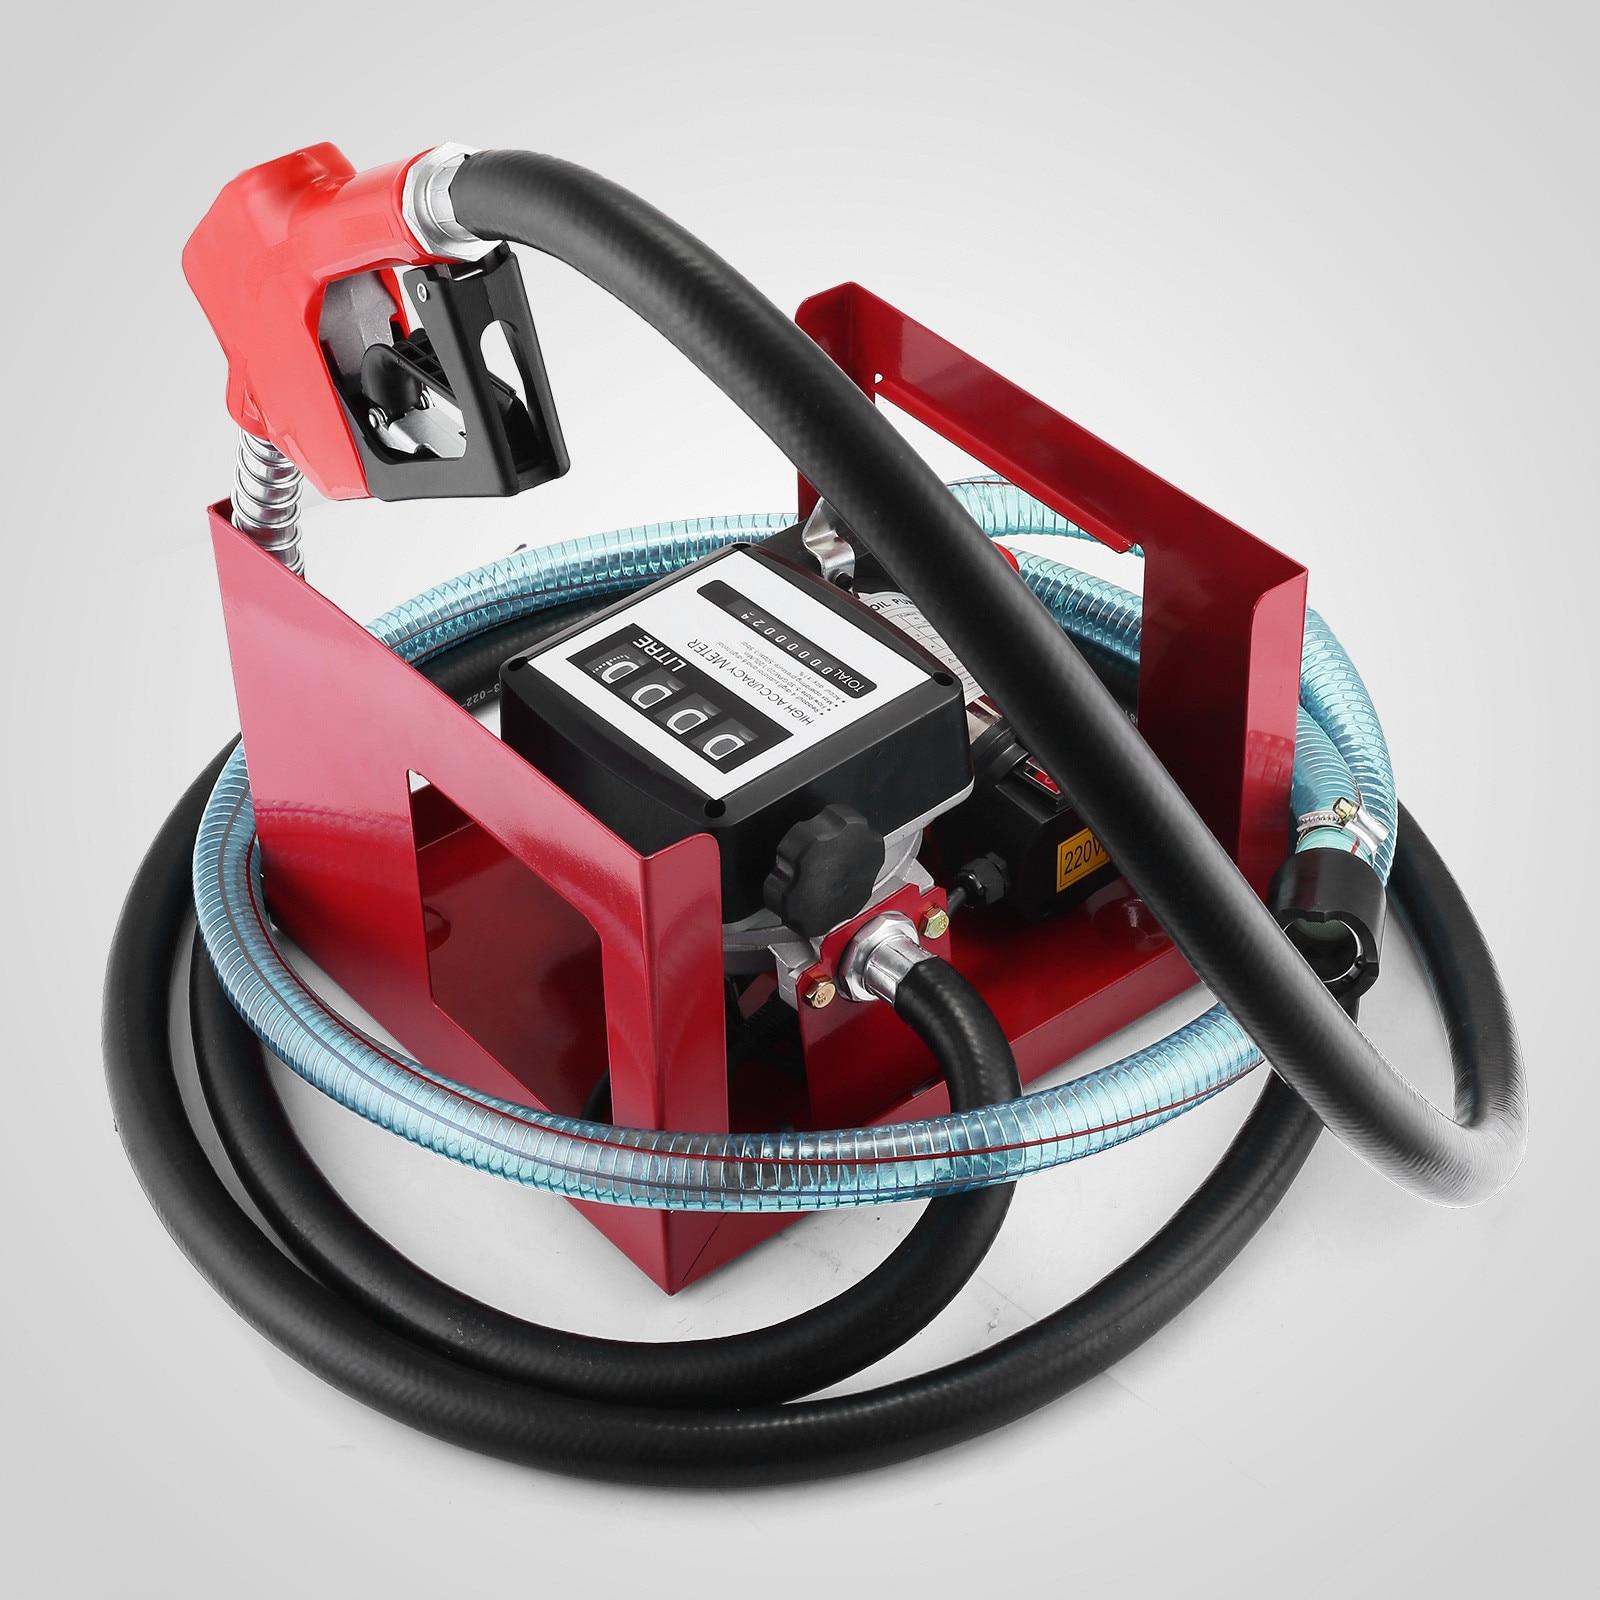 H/D Self Priming Electric Oil Pump Transfer Bio Fuel Oil Diesel 230v 40L/Min New - 4